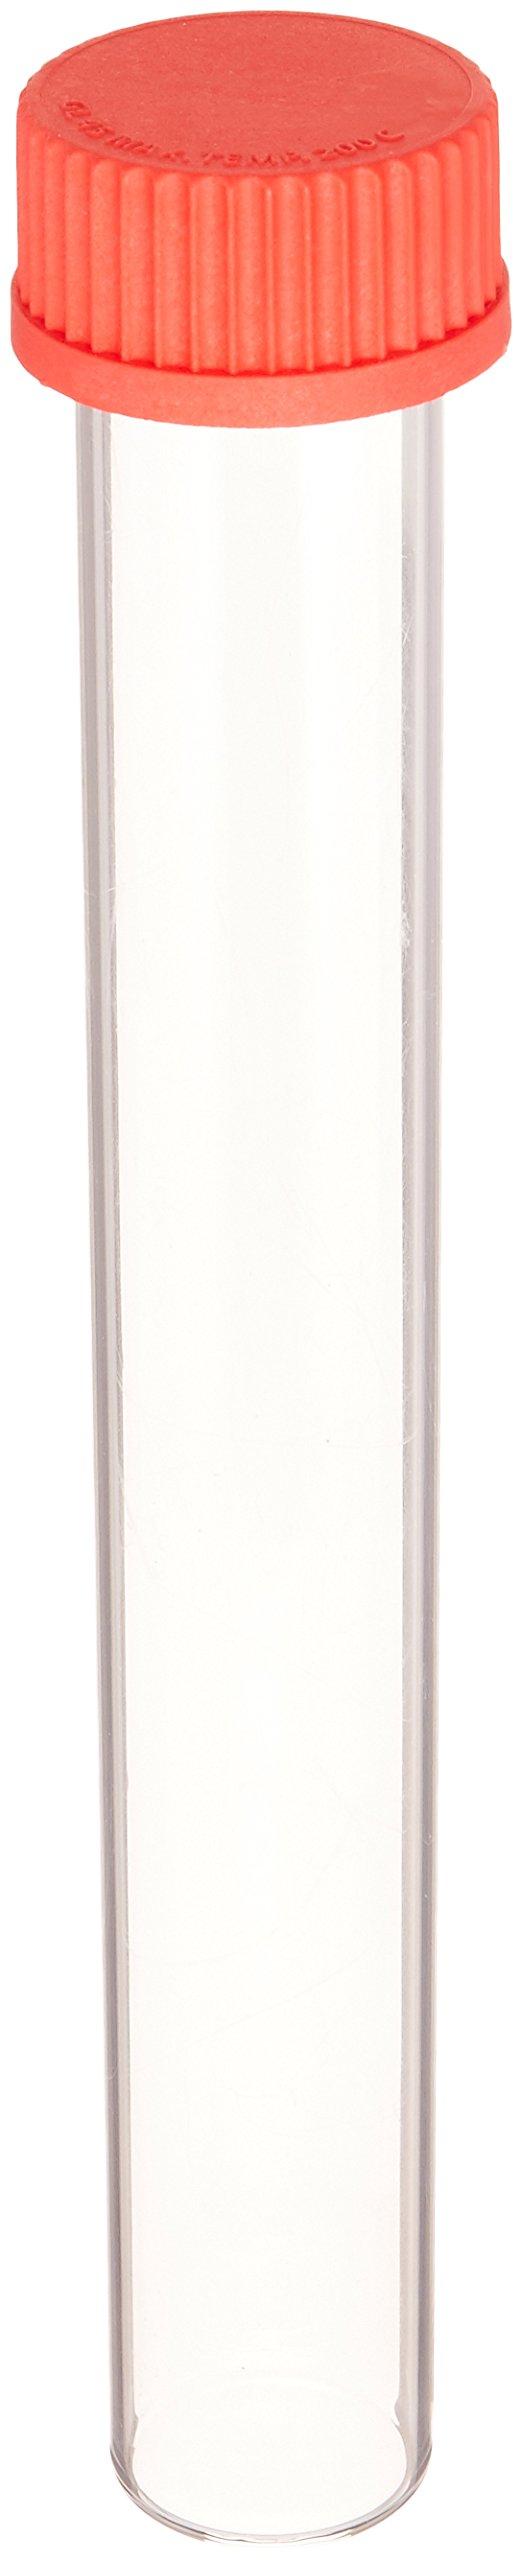 UVP Hybridizer 07-0194-02 Large Glass Borosilicate Hybridization Bottle with Cap for Hybridization Oven, 35mm Diameter x 300mm Length